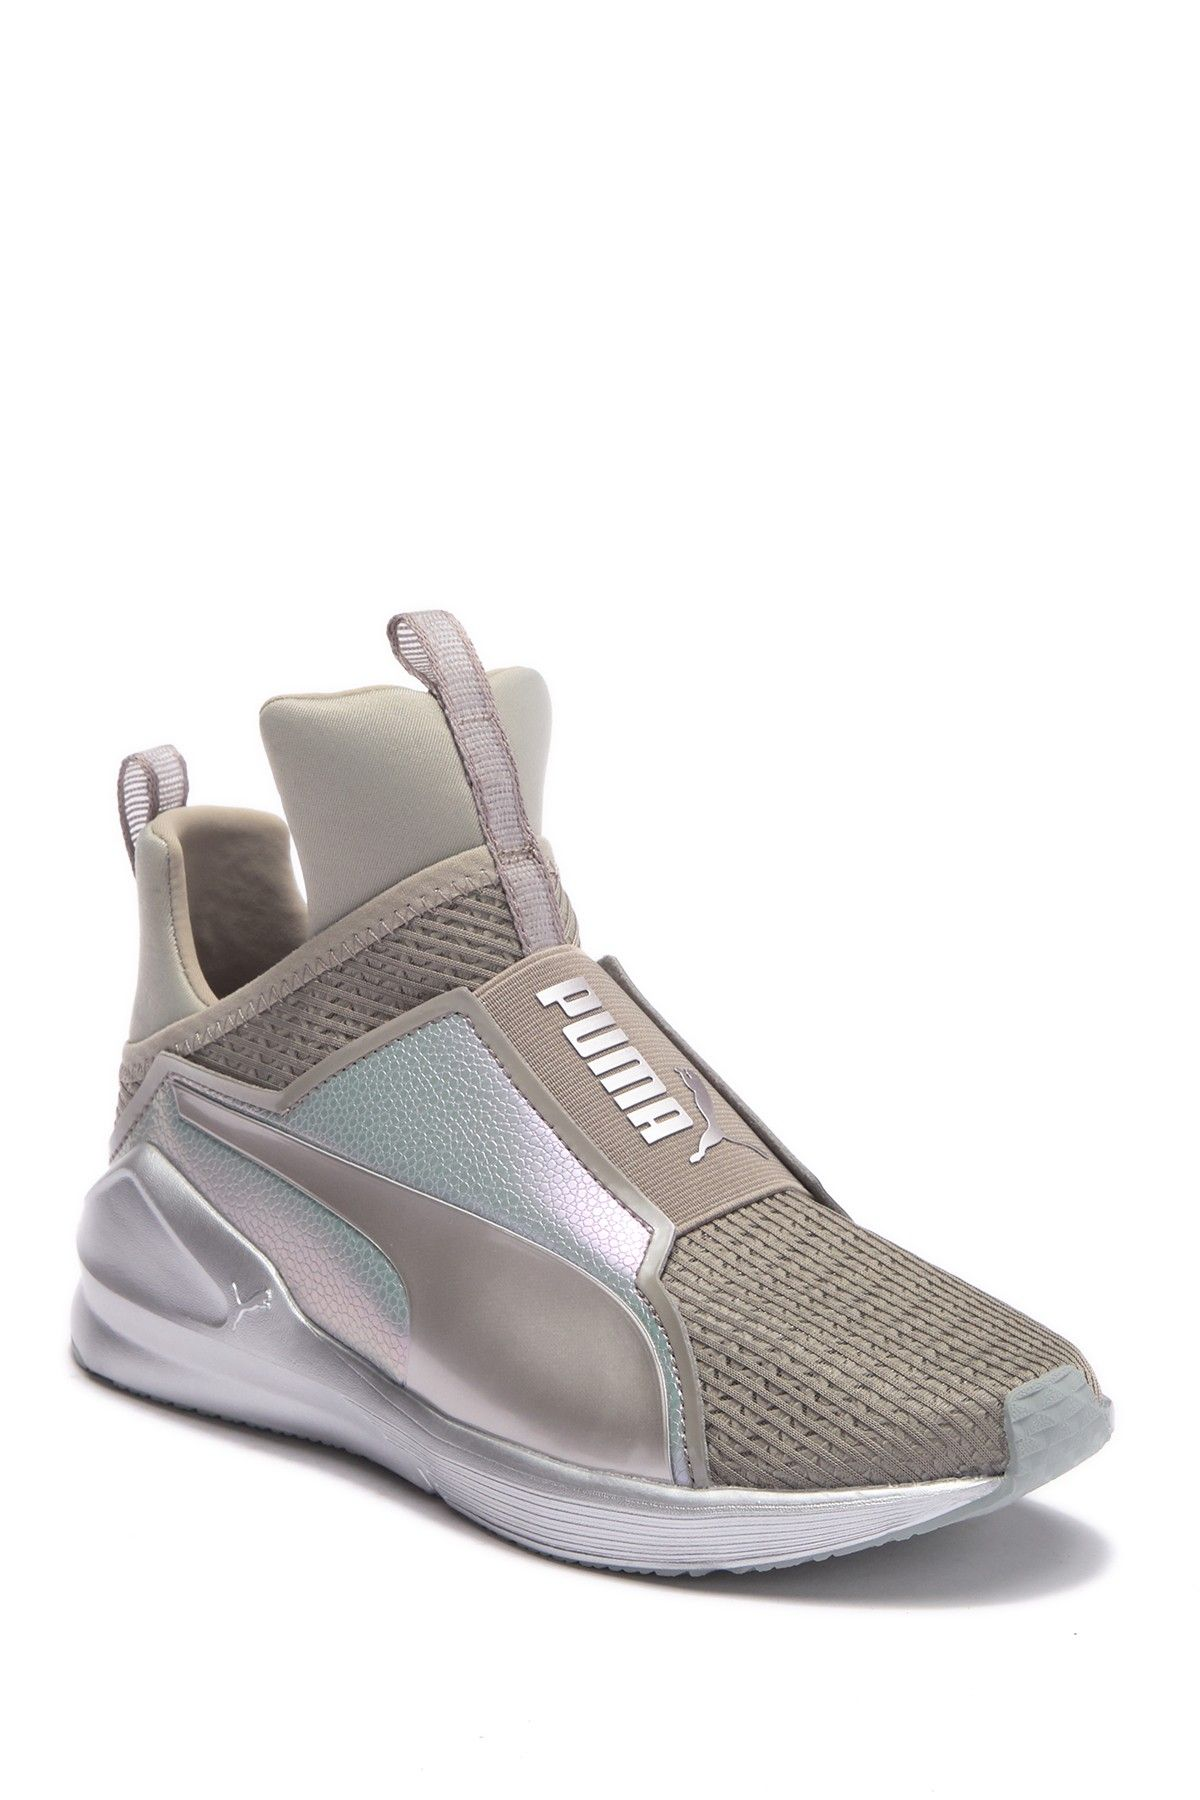 PUMA | Fierce EP Metallic Sneaker | Sneakers, Puma shoes